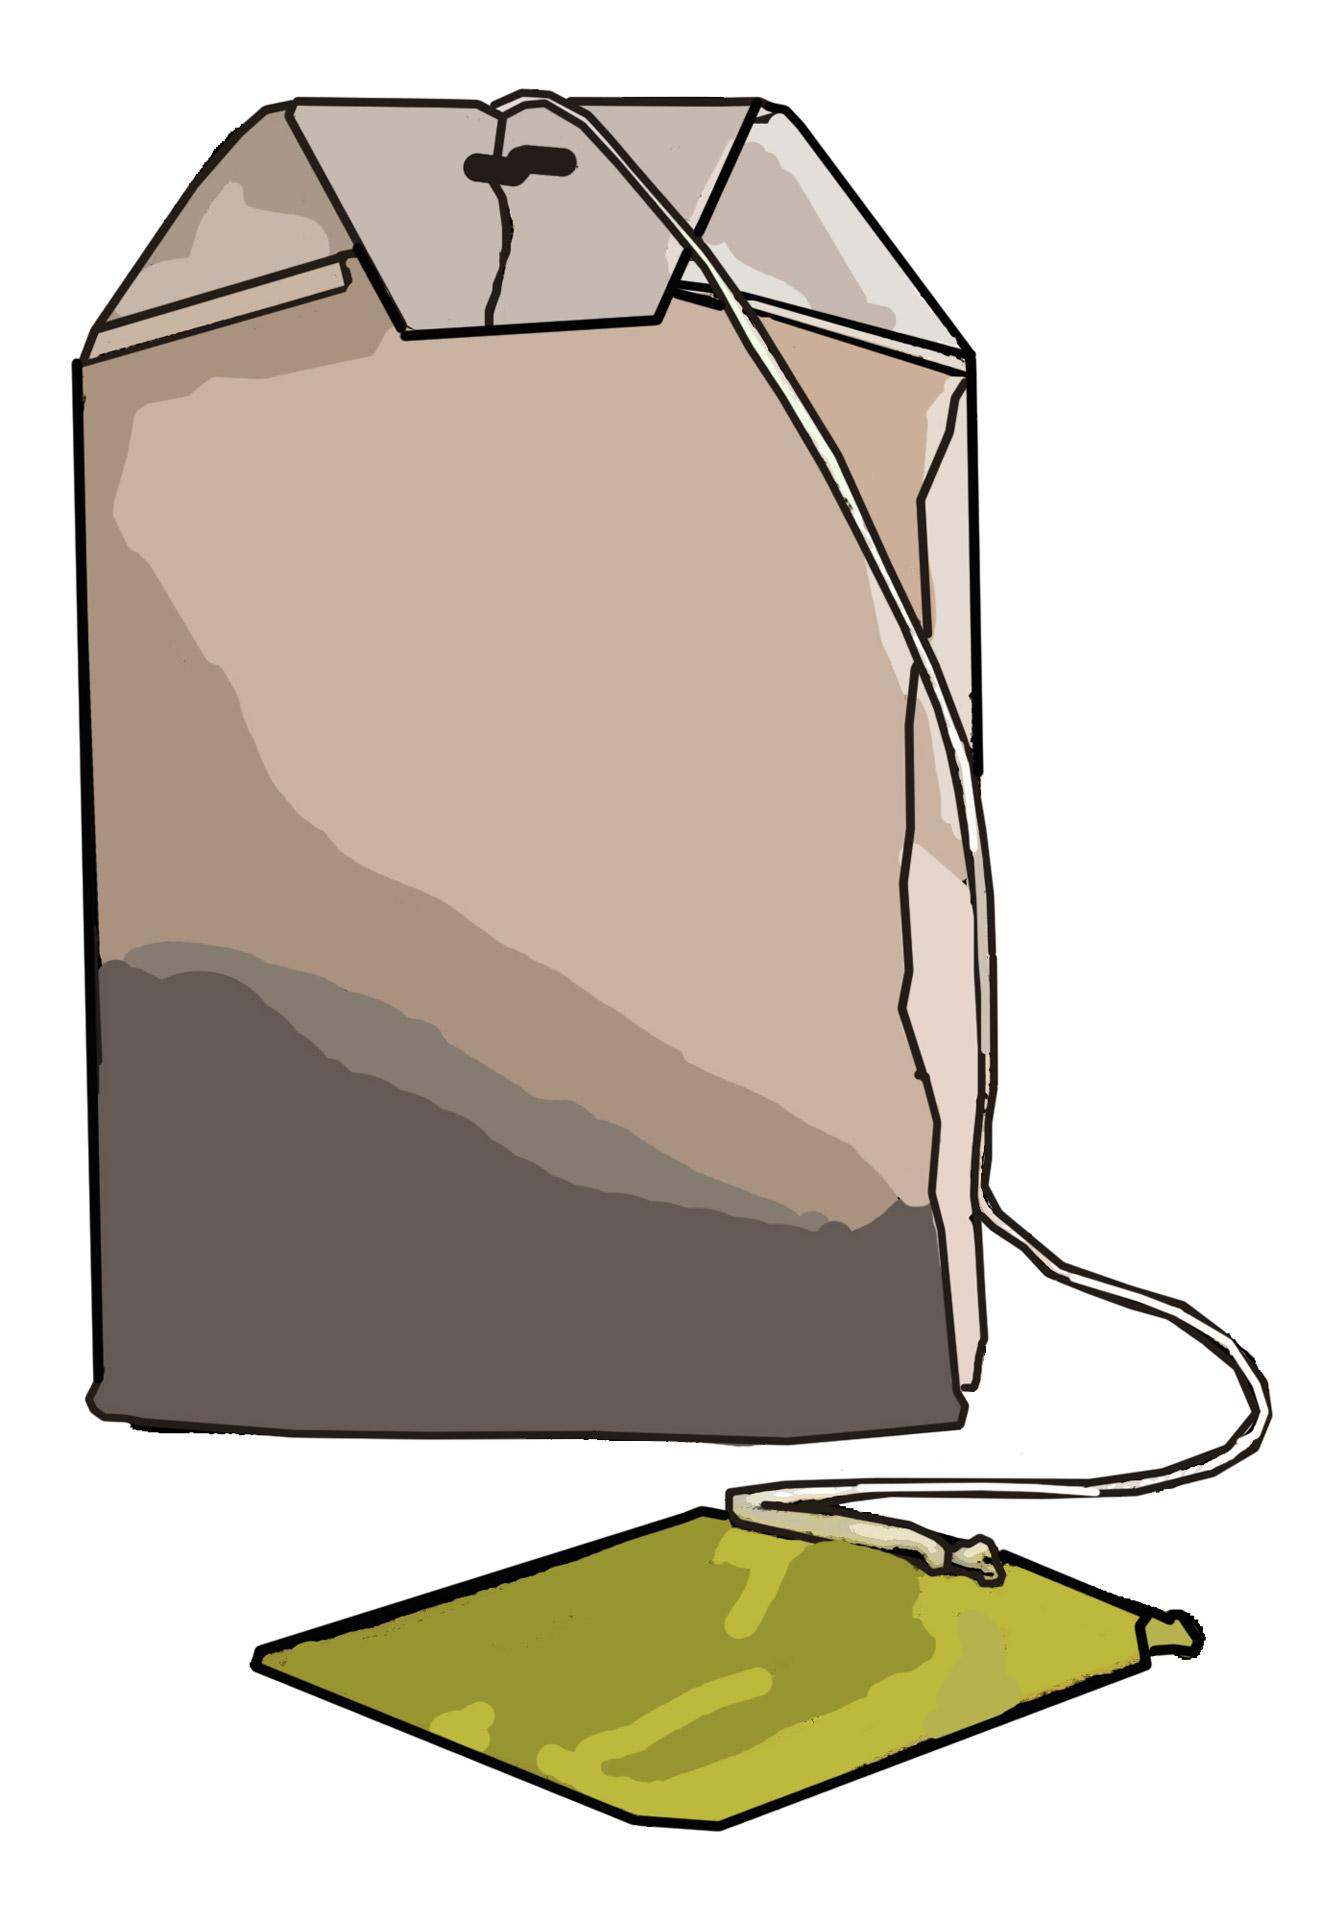 1344x1920 Tea Bag Clip Art Free Stock Photo